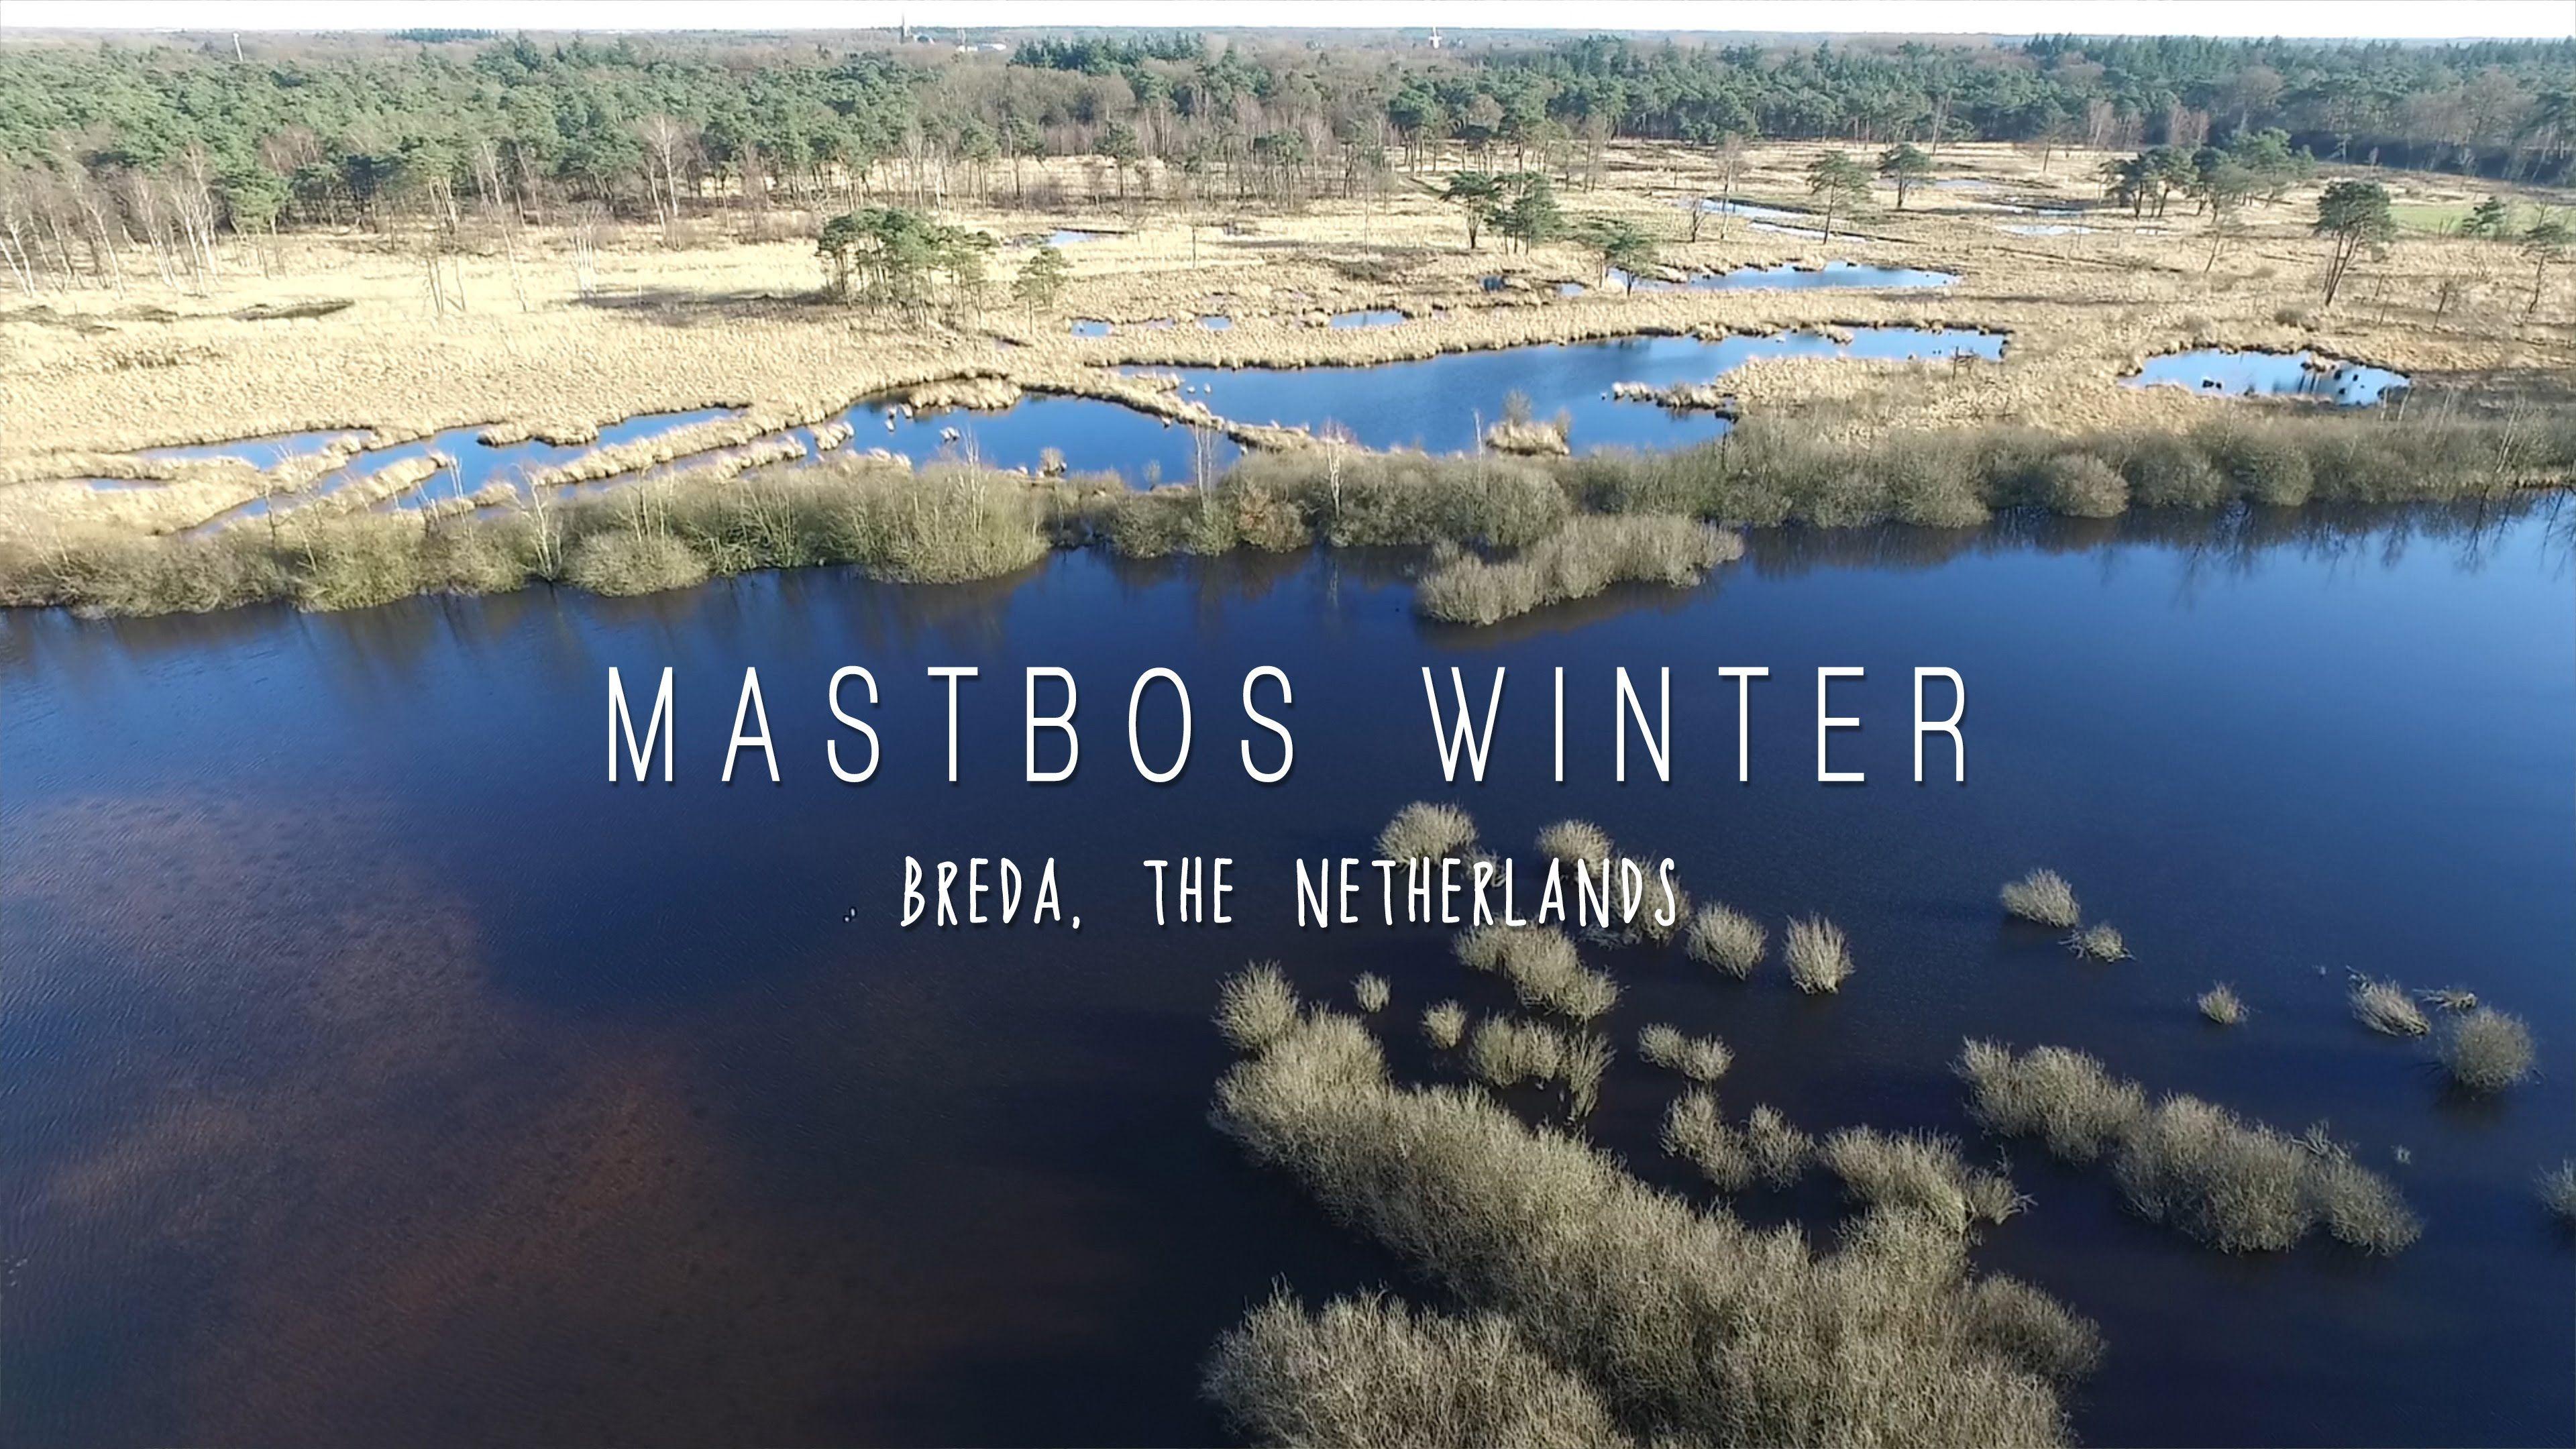 Mastbos Breda - Winterdag. Zonnige winterdag in januari 2016 in het 500-jarige Mastbos. Mastbos Breda, The Netherlands. DJI Phantom 3 Professional aerial shots – copyright larsscheve.nl.